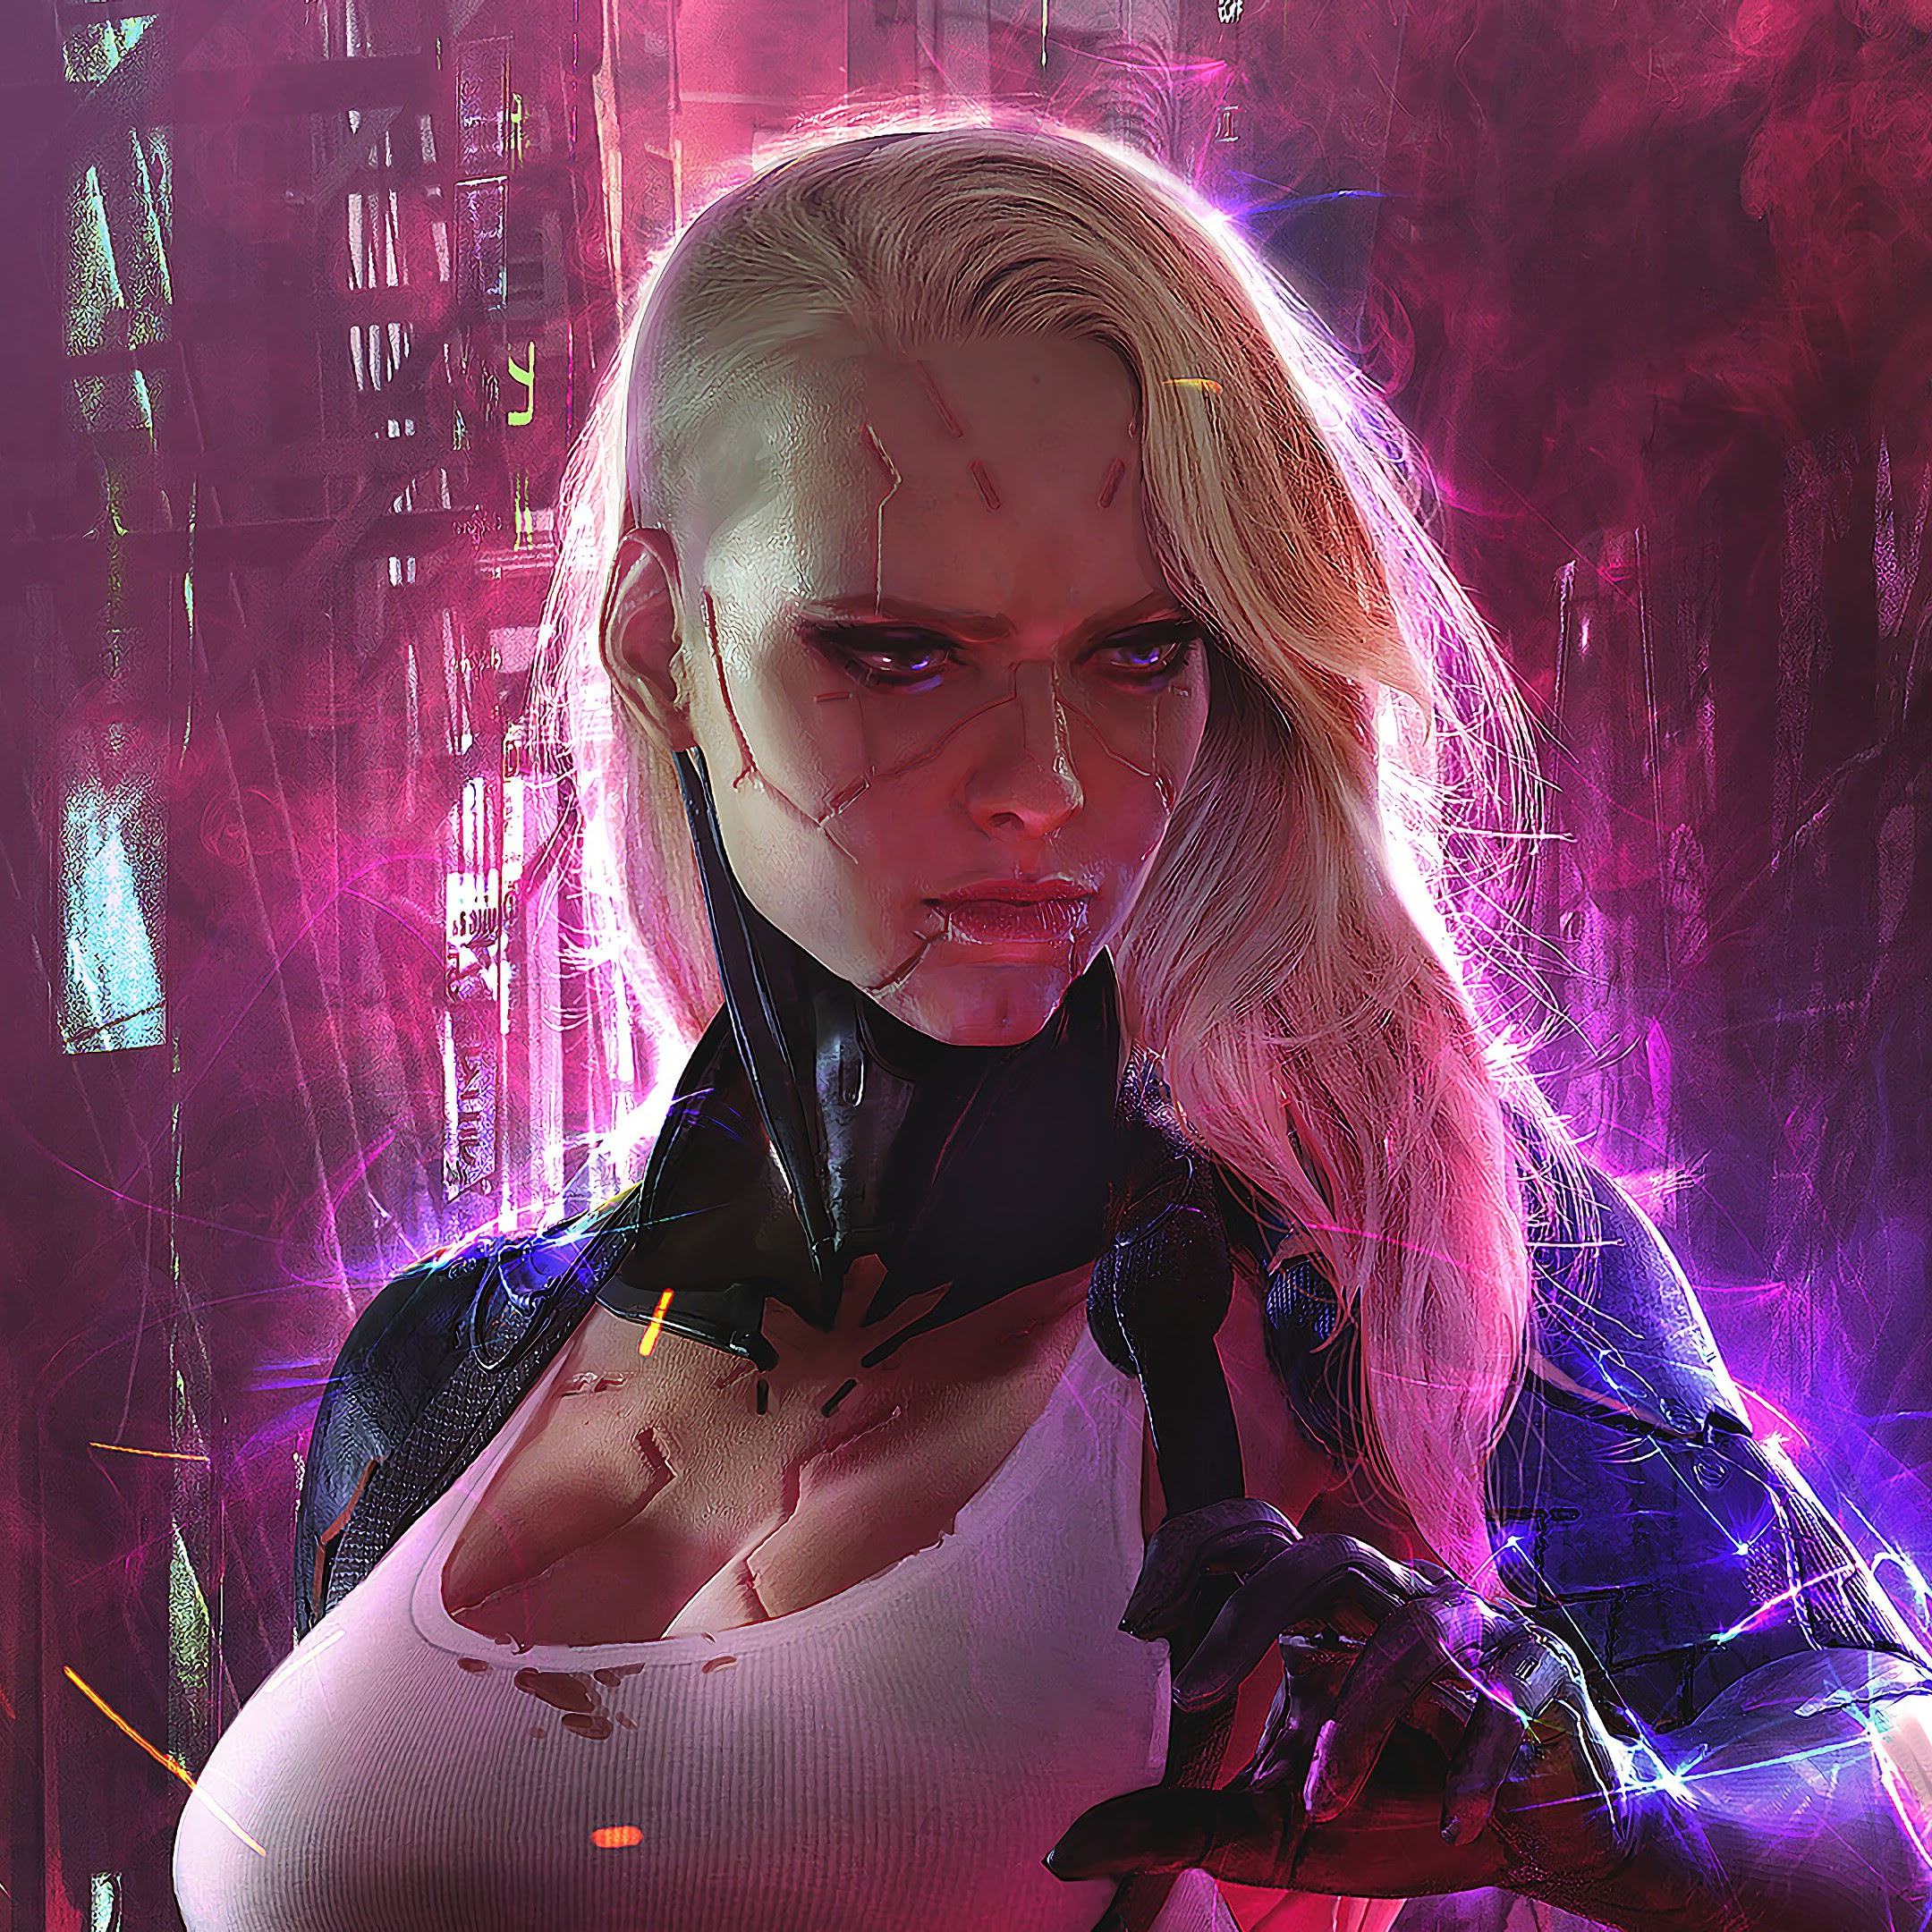 Cyberpunk, Girl, Sci-Fi, 4K, #144 Wallpaper